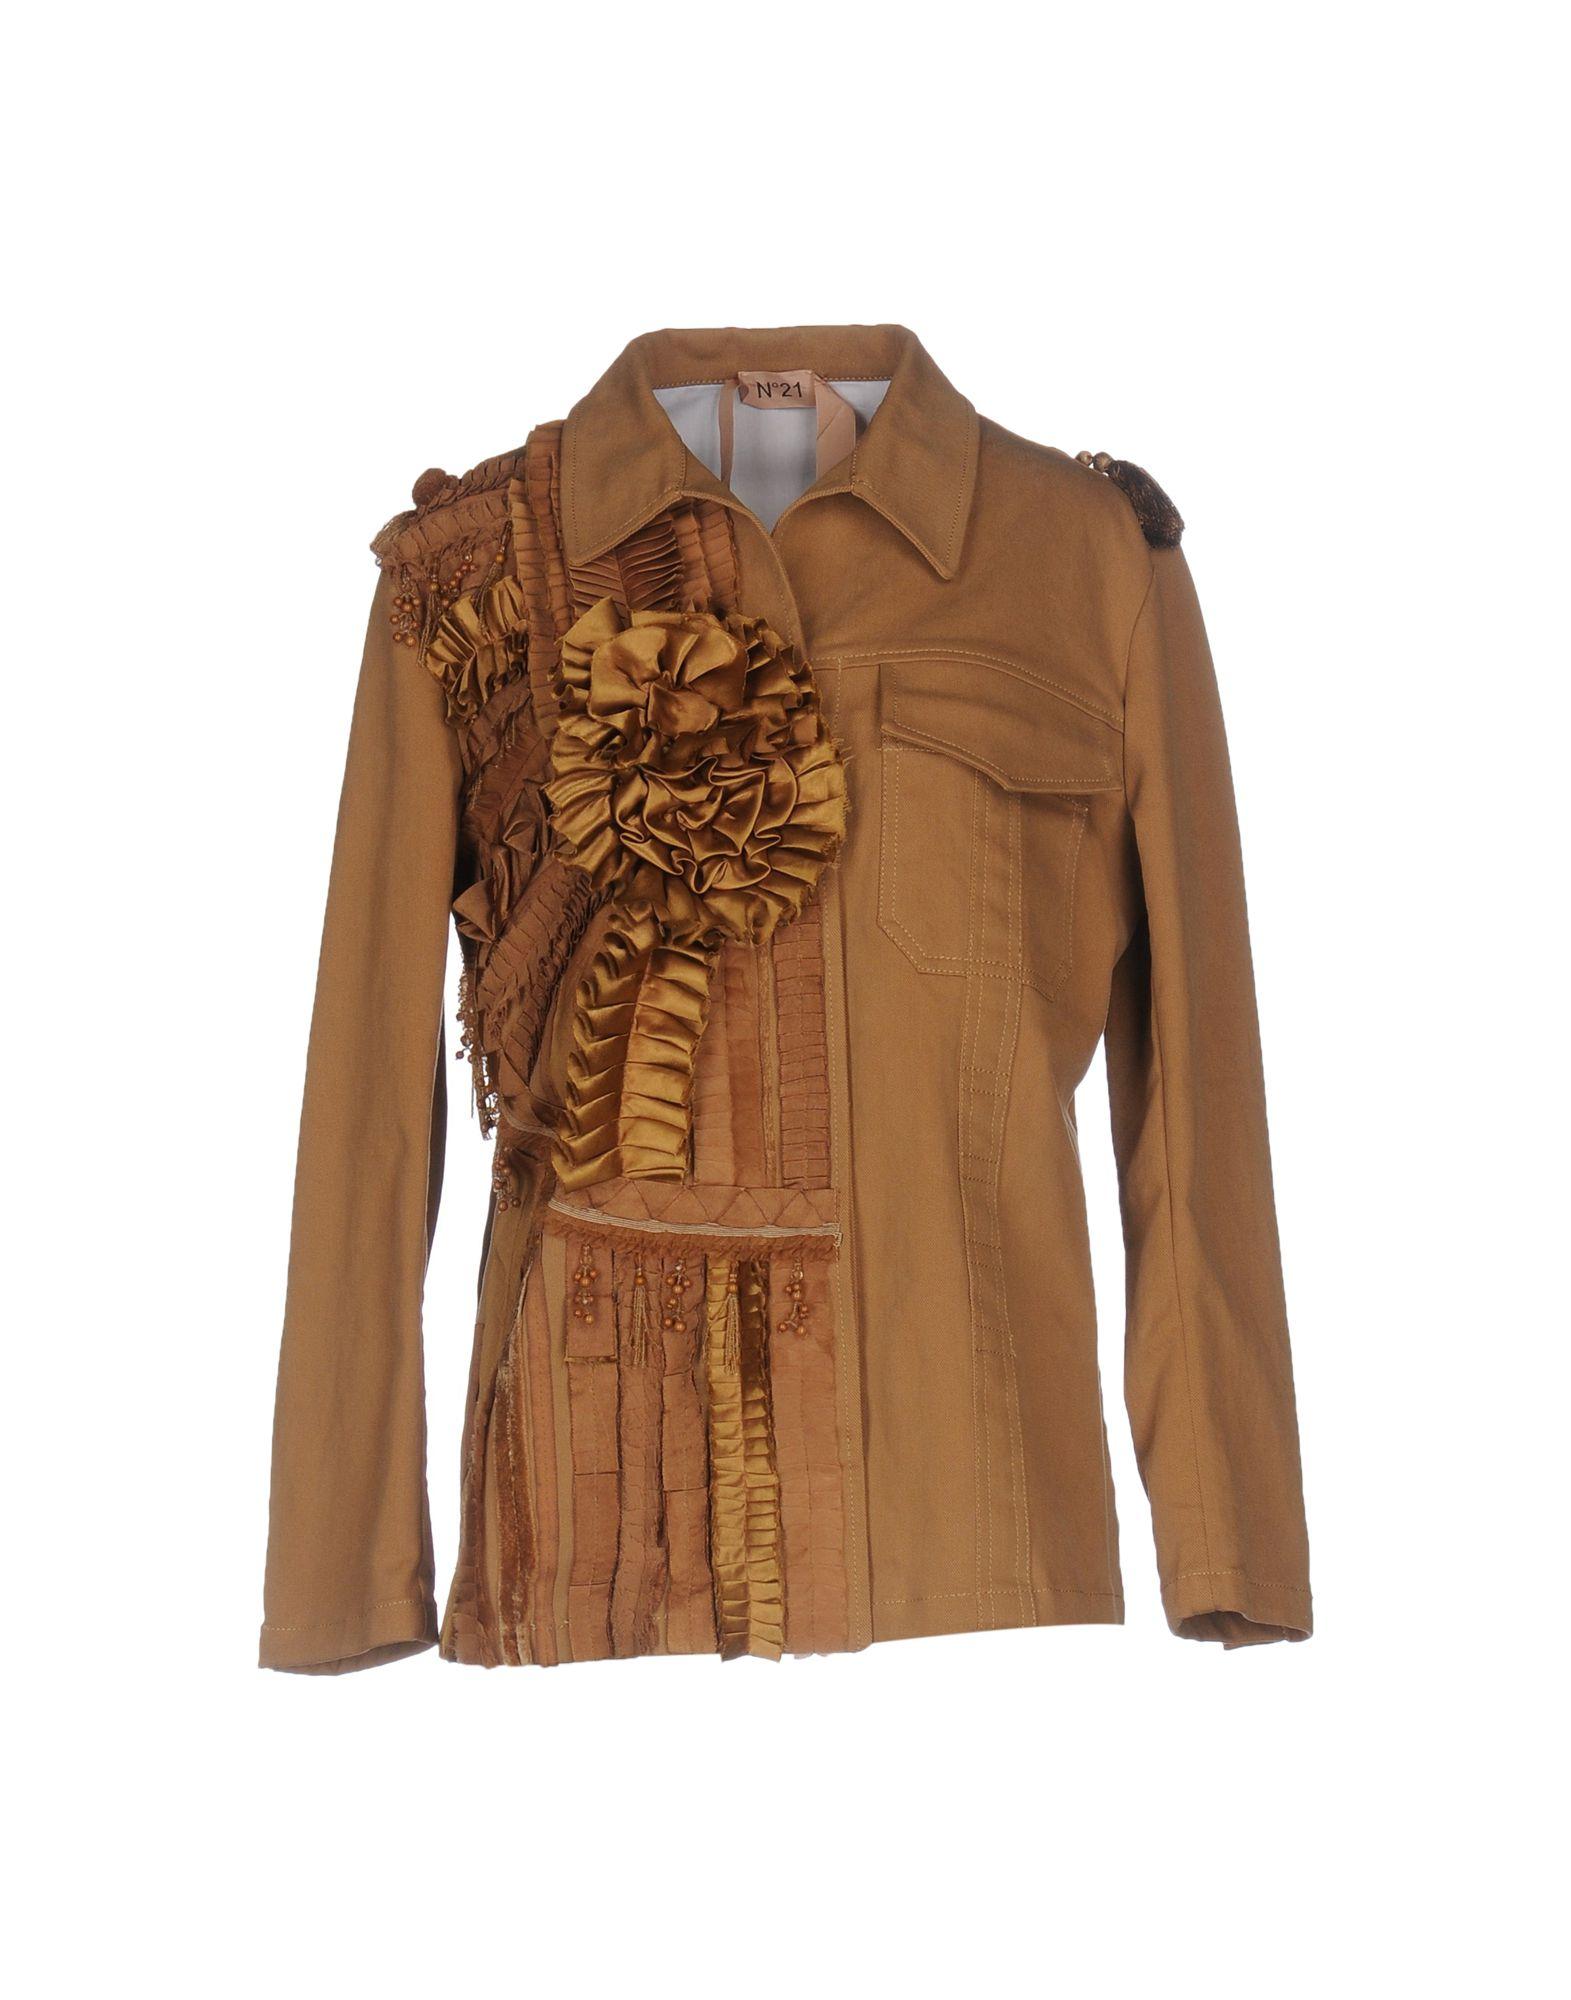 N° 21 Damen Jacke Farbe Khaki Größe 4